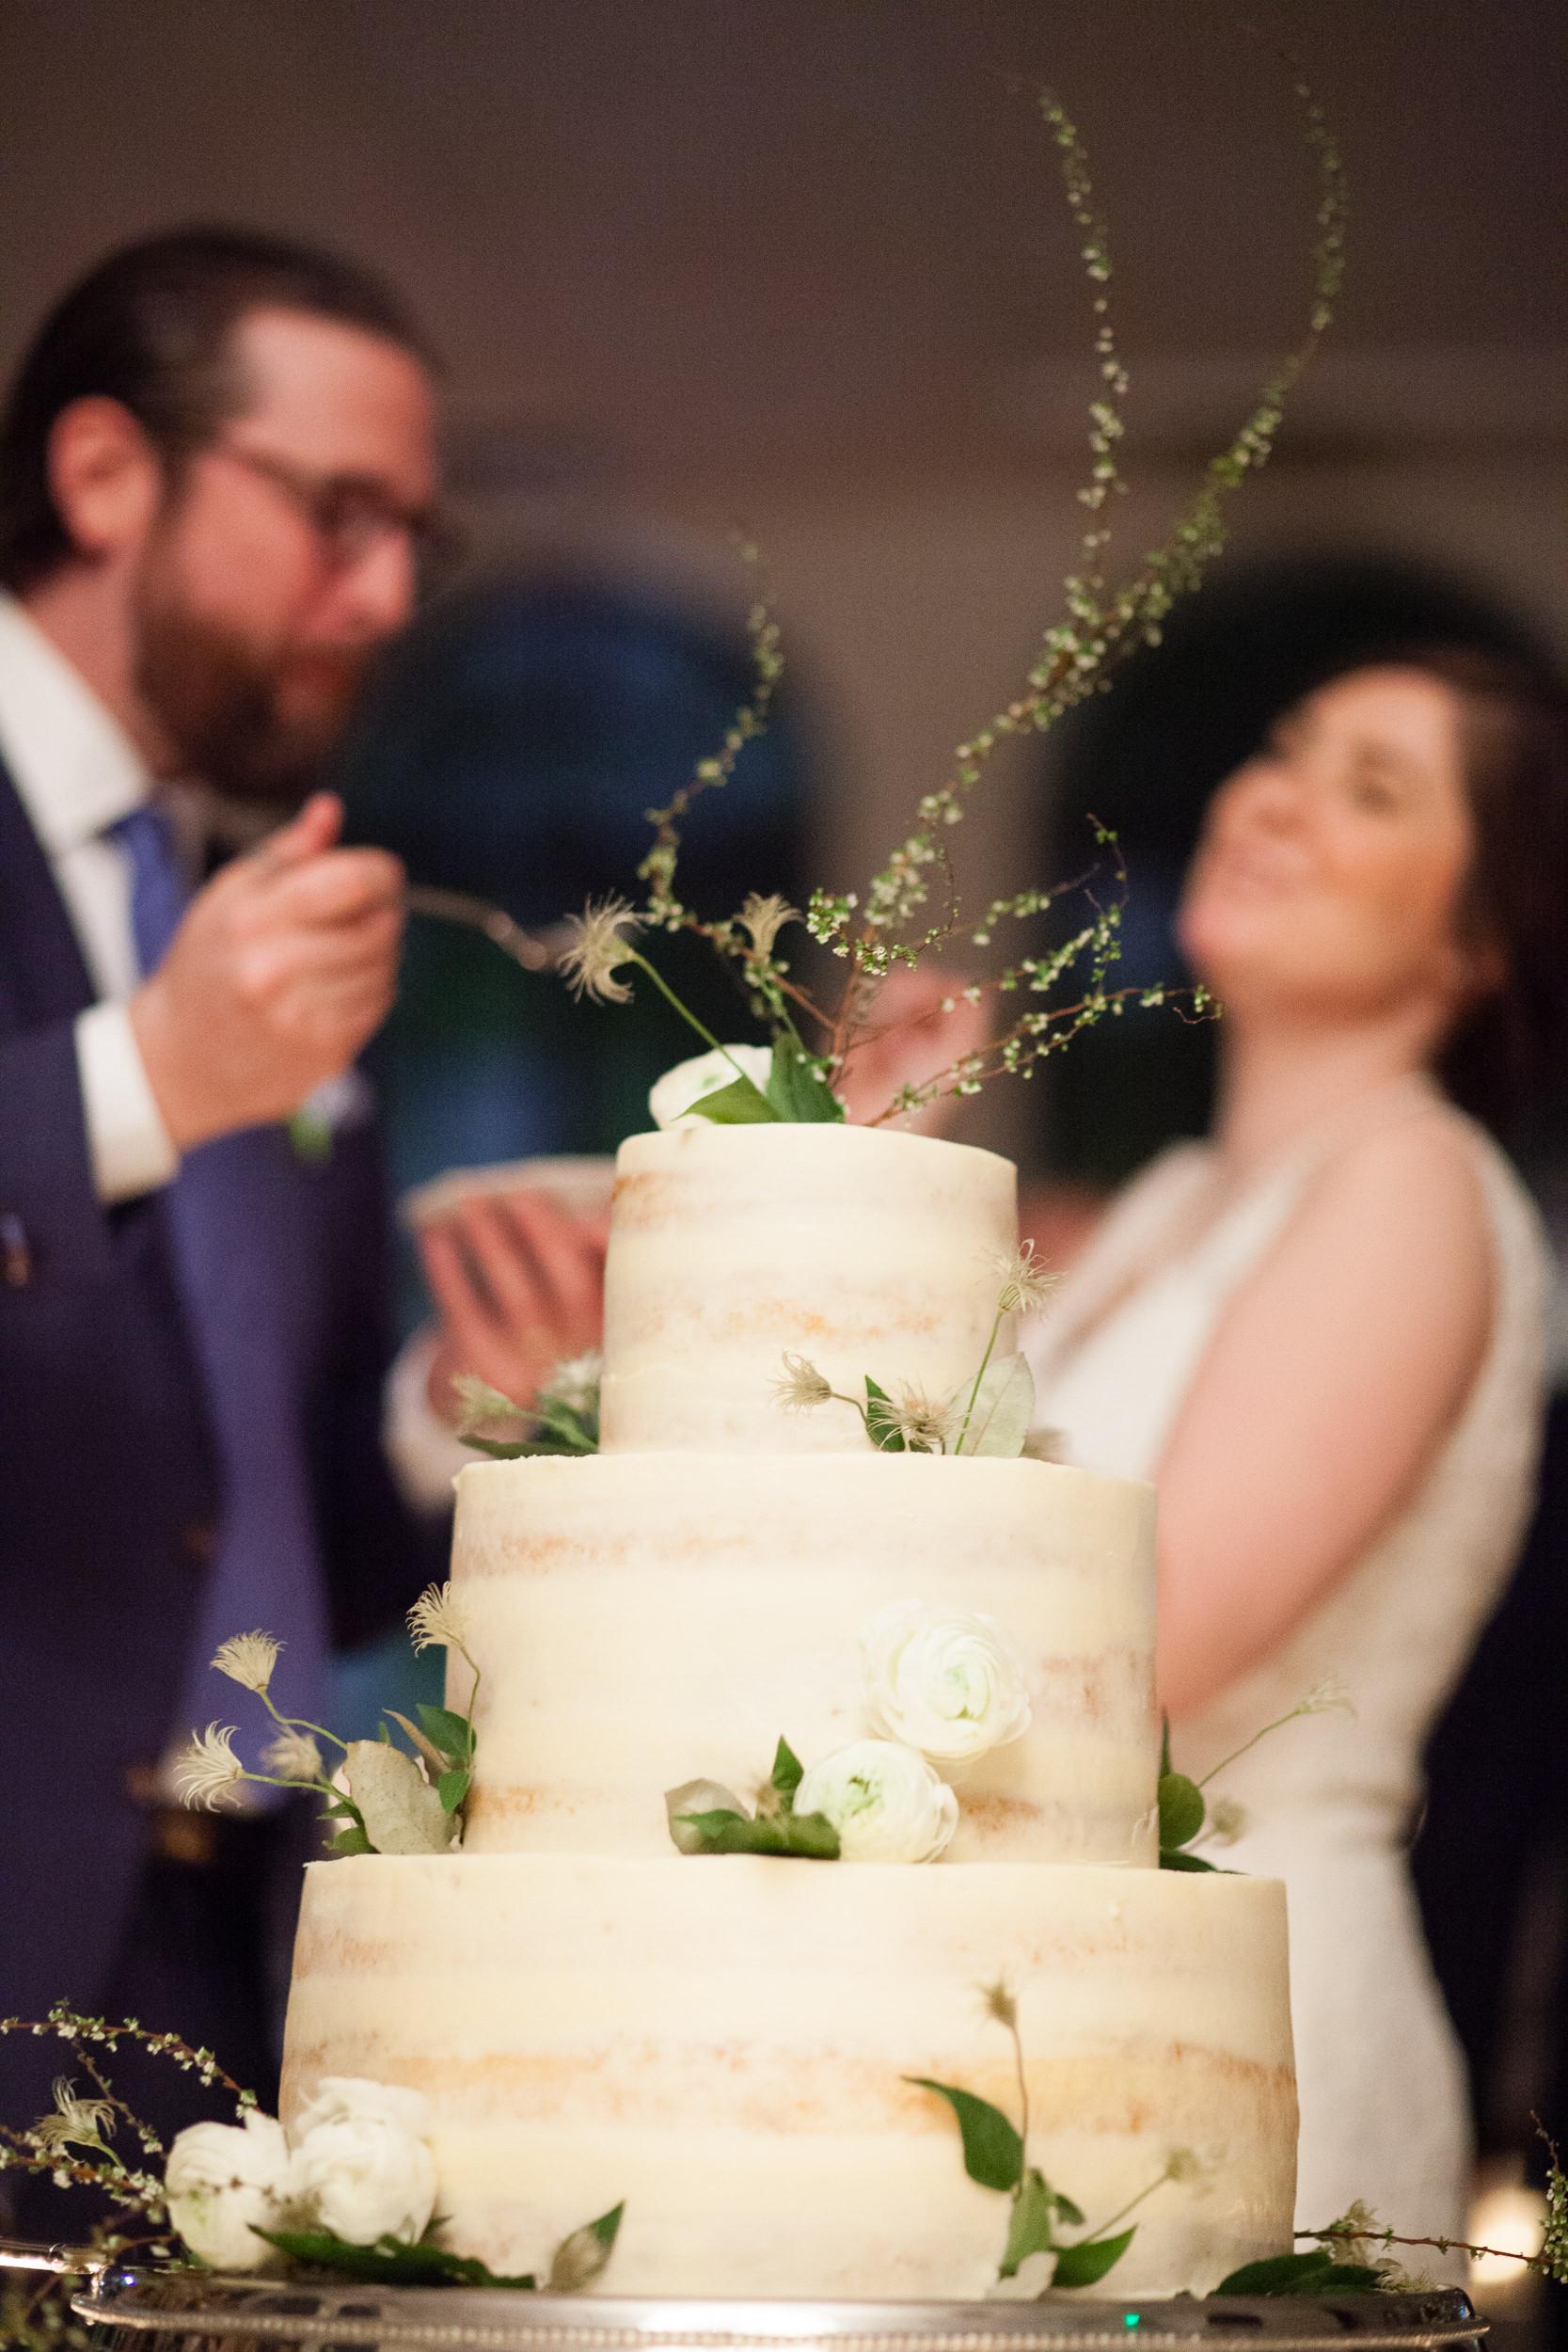 LK_Birmingham_AL_Wedding_2019-00061.jpg